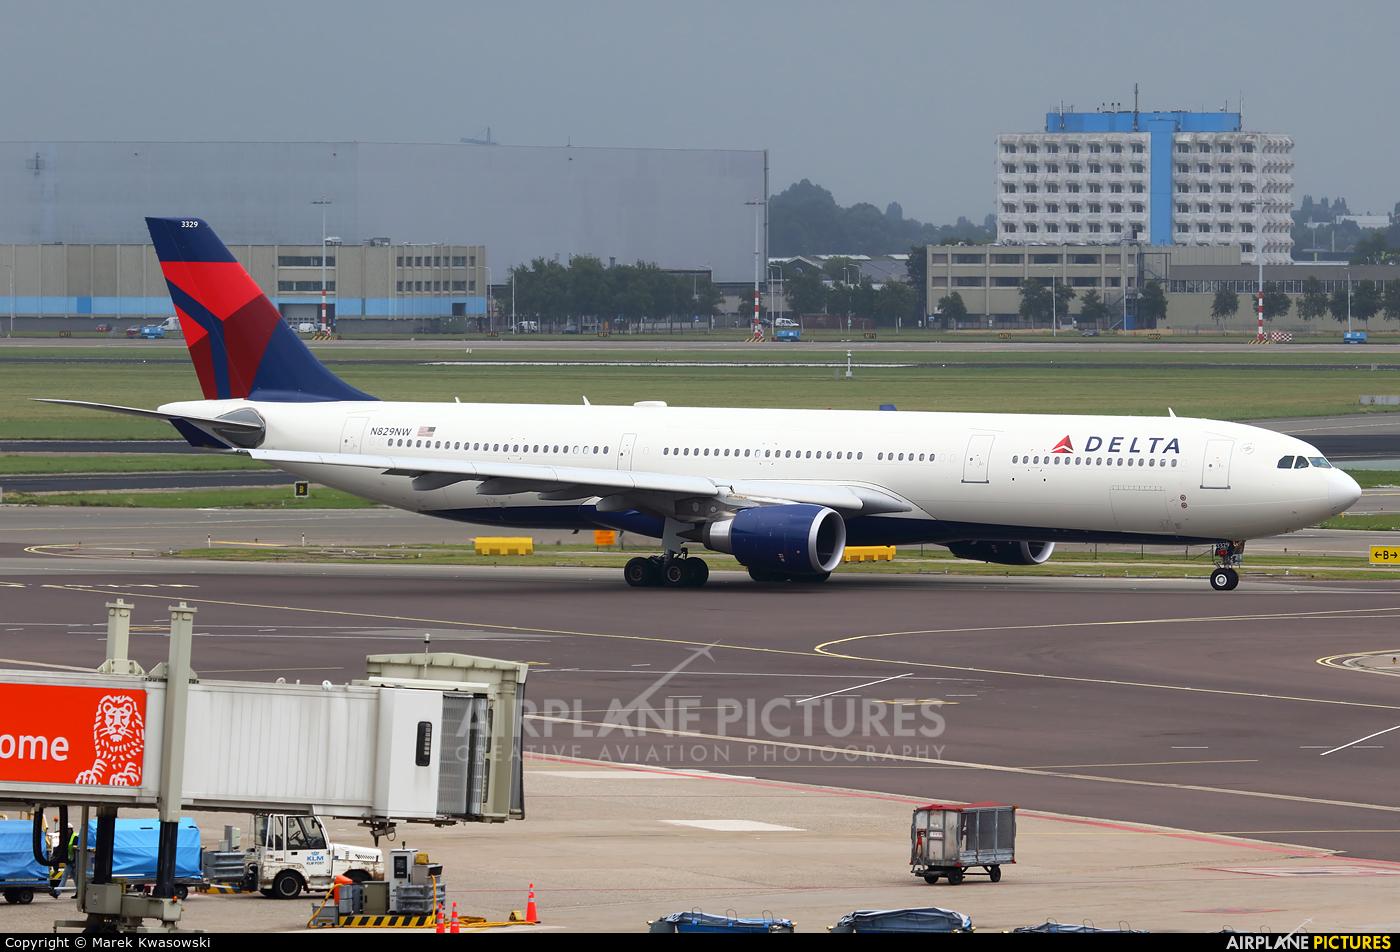 Delta Air Lines N829NW aircraft at Amsterdam - Schiphol